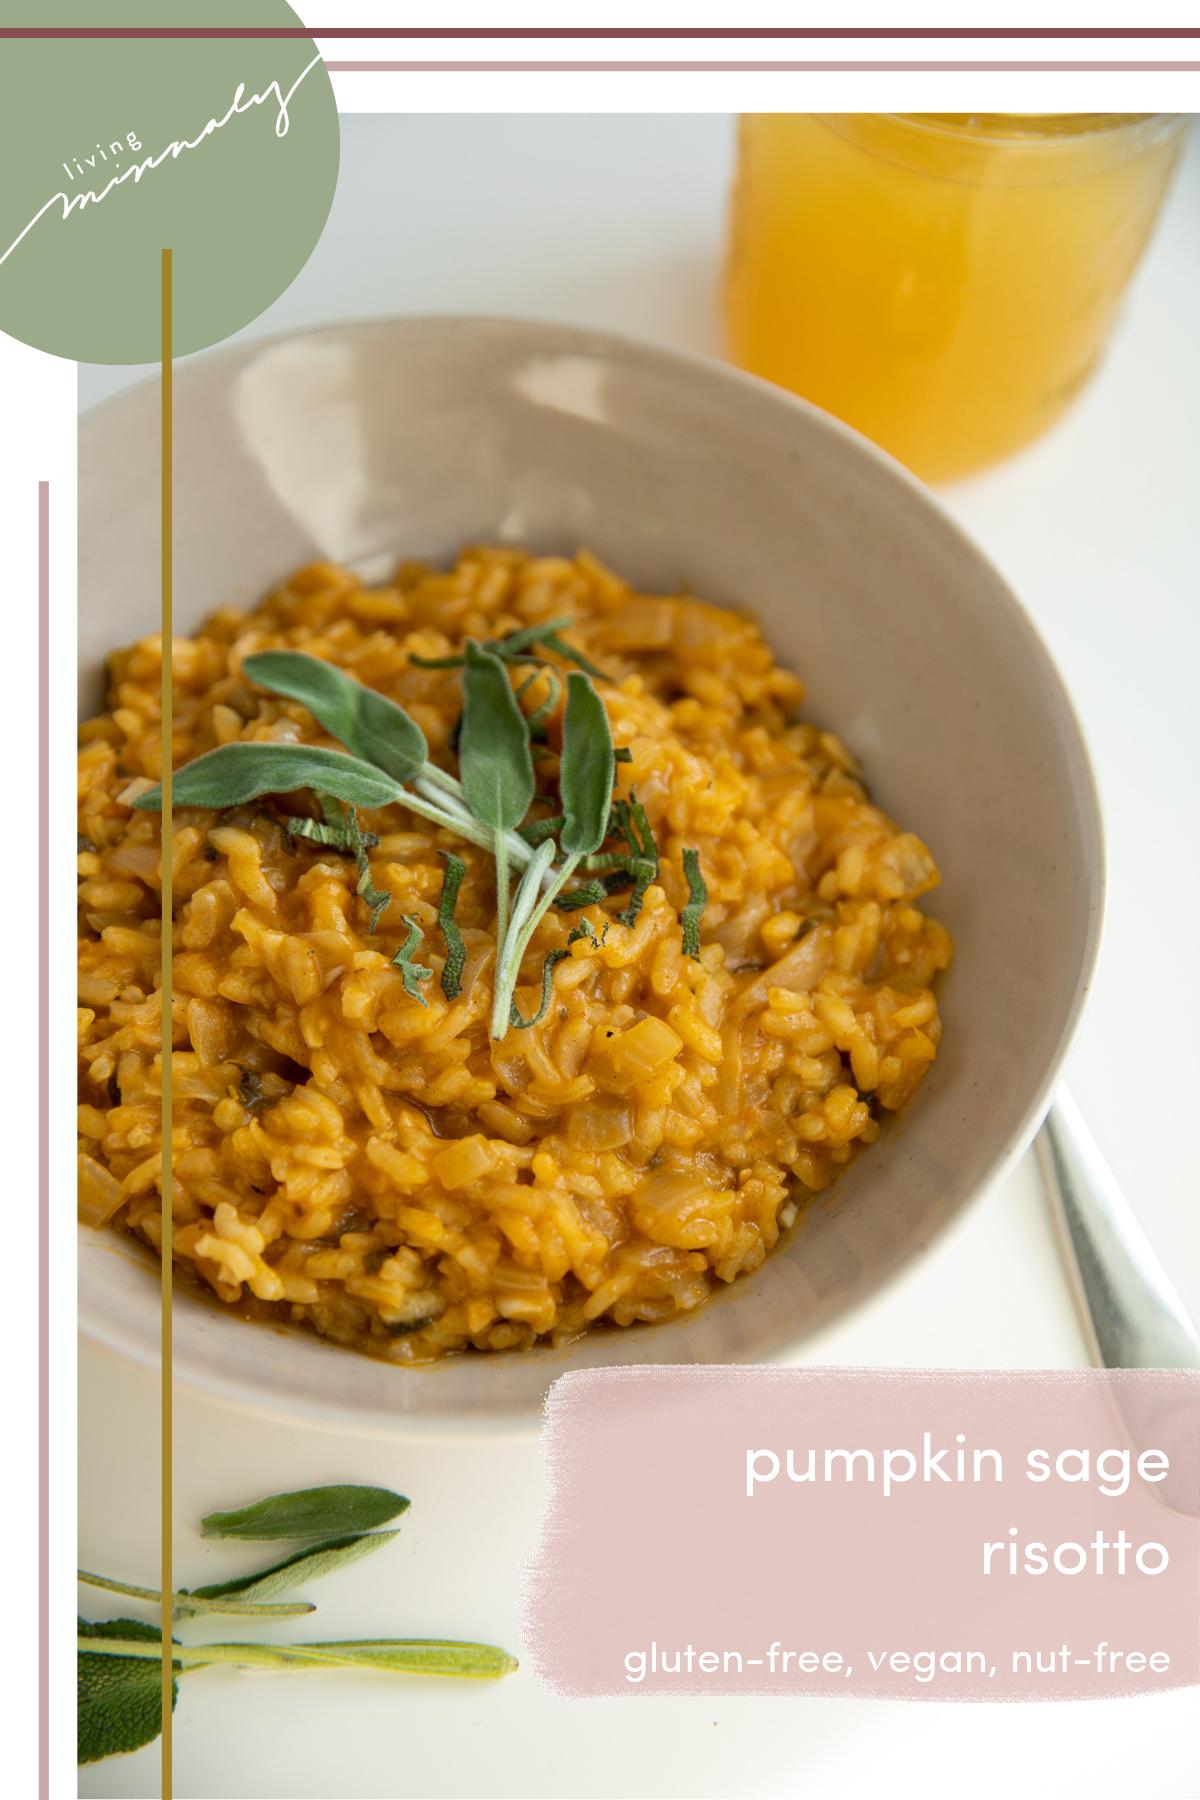 Pumpkin Sage Risotto ( GF + Vegan) | Living Minnaly